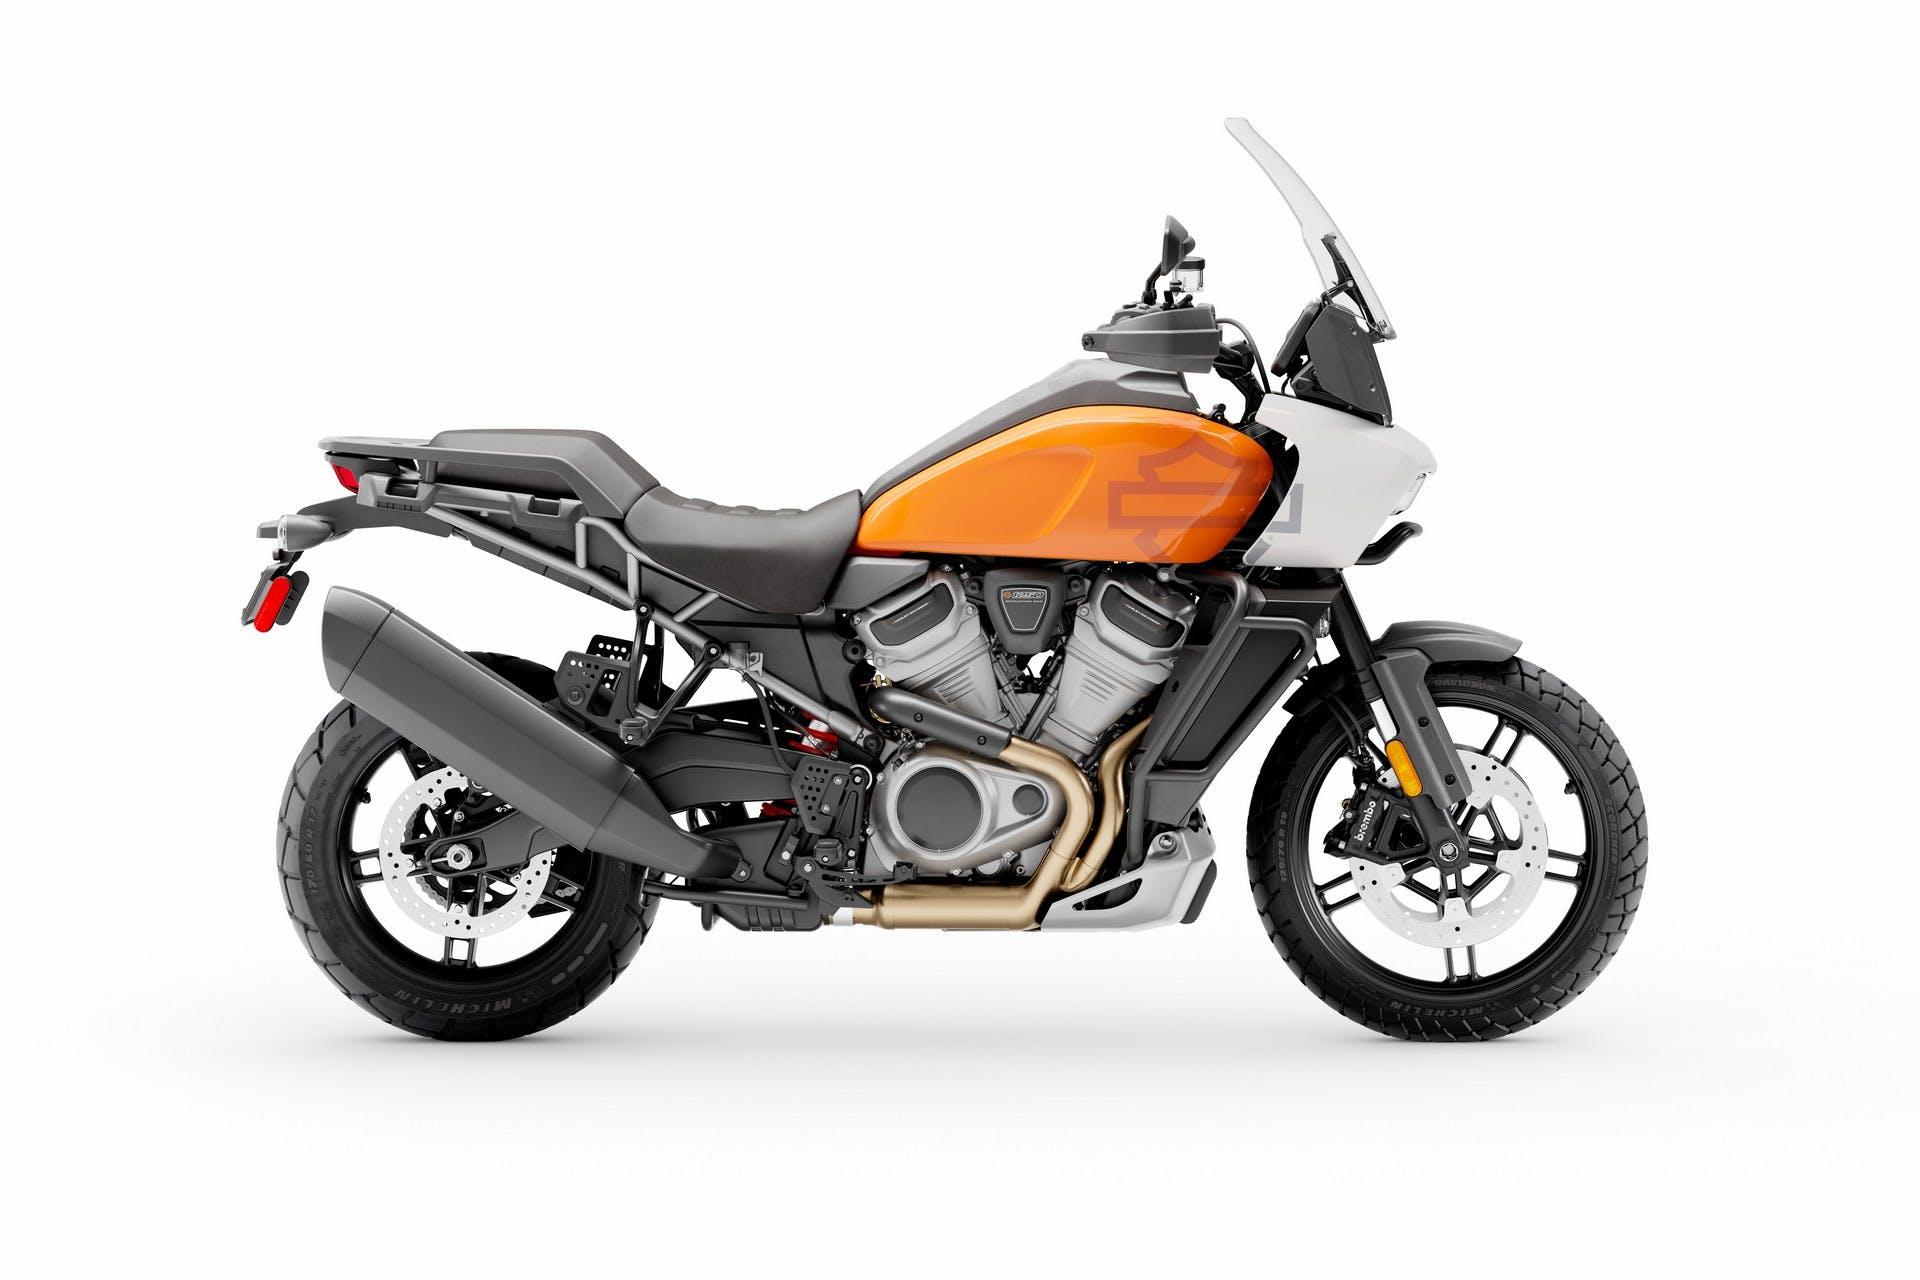 Harley Davidson Pan America Special